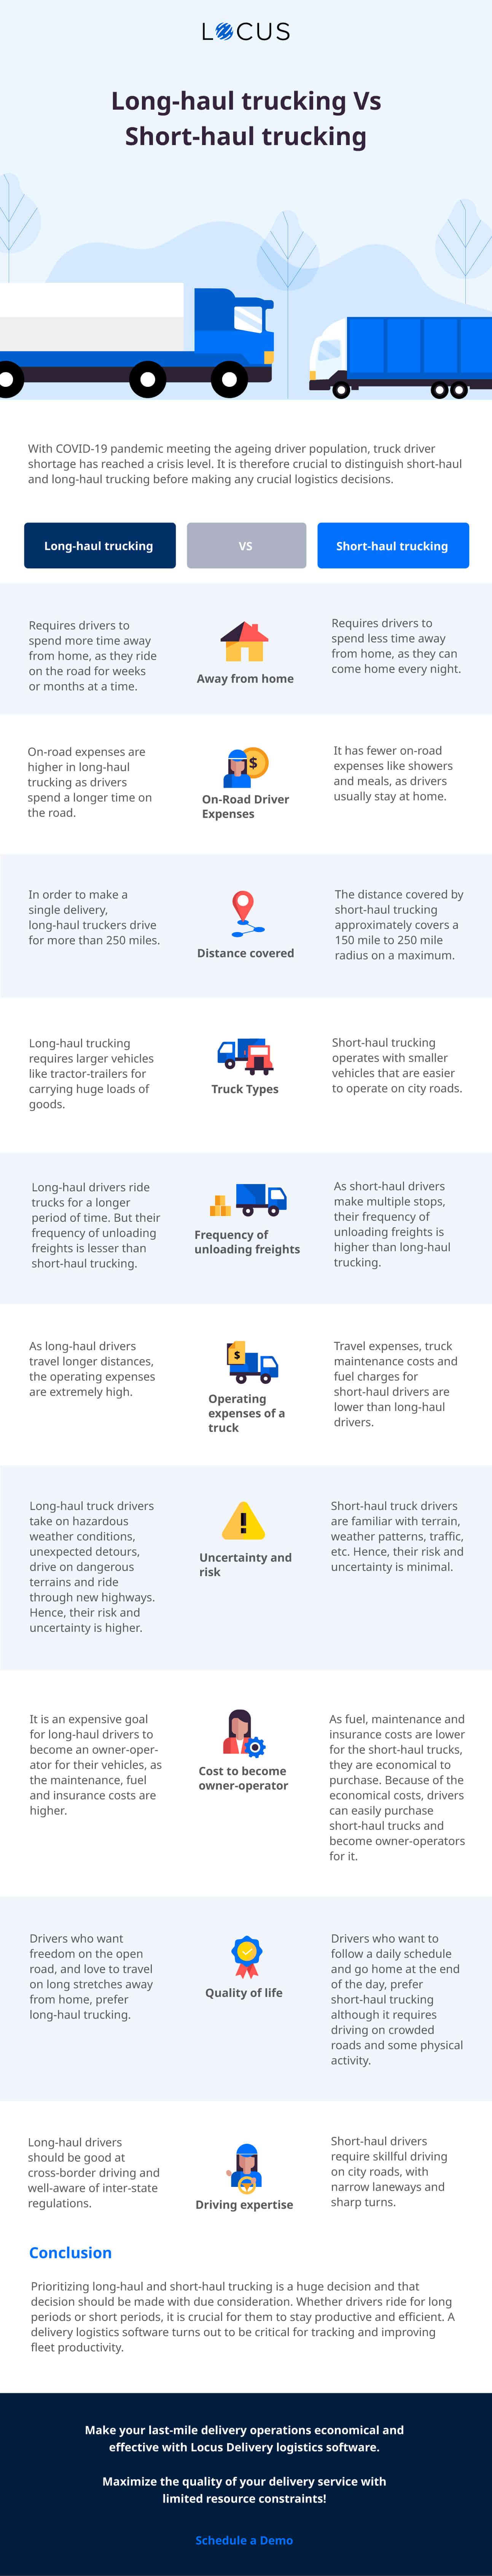 Difference Long-haul trucking Vs Short-haul trucking